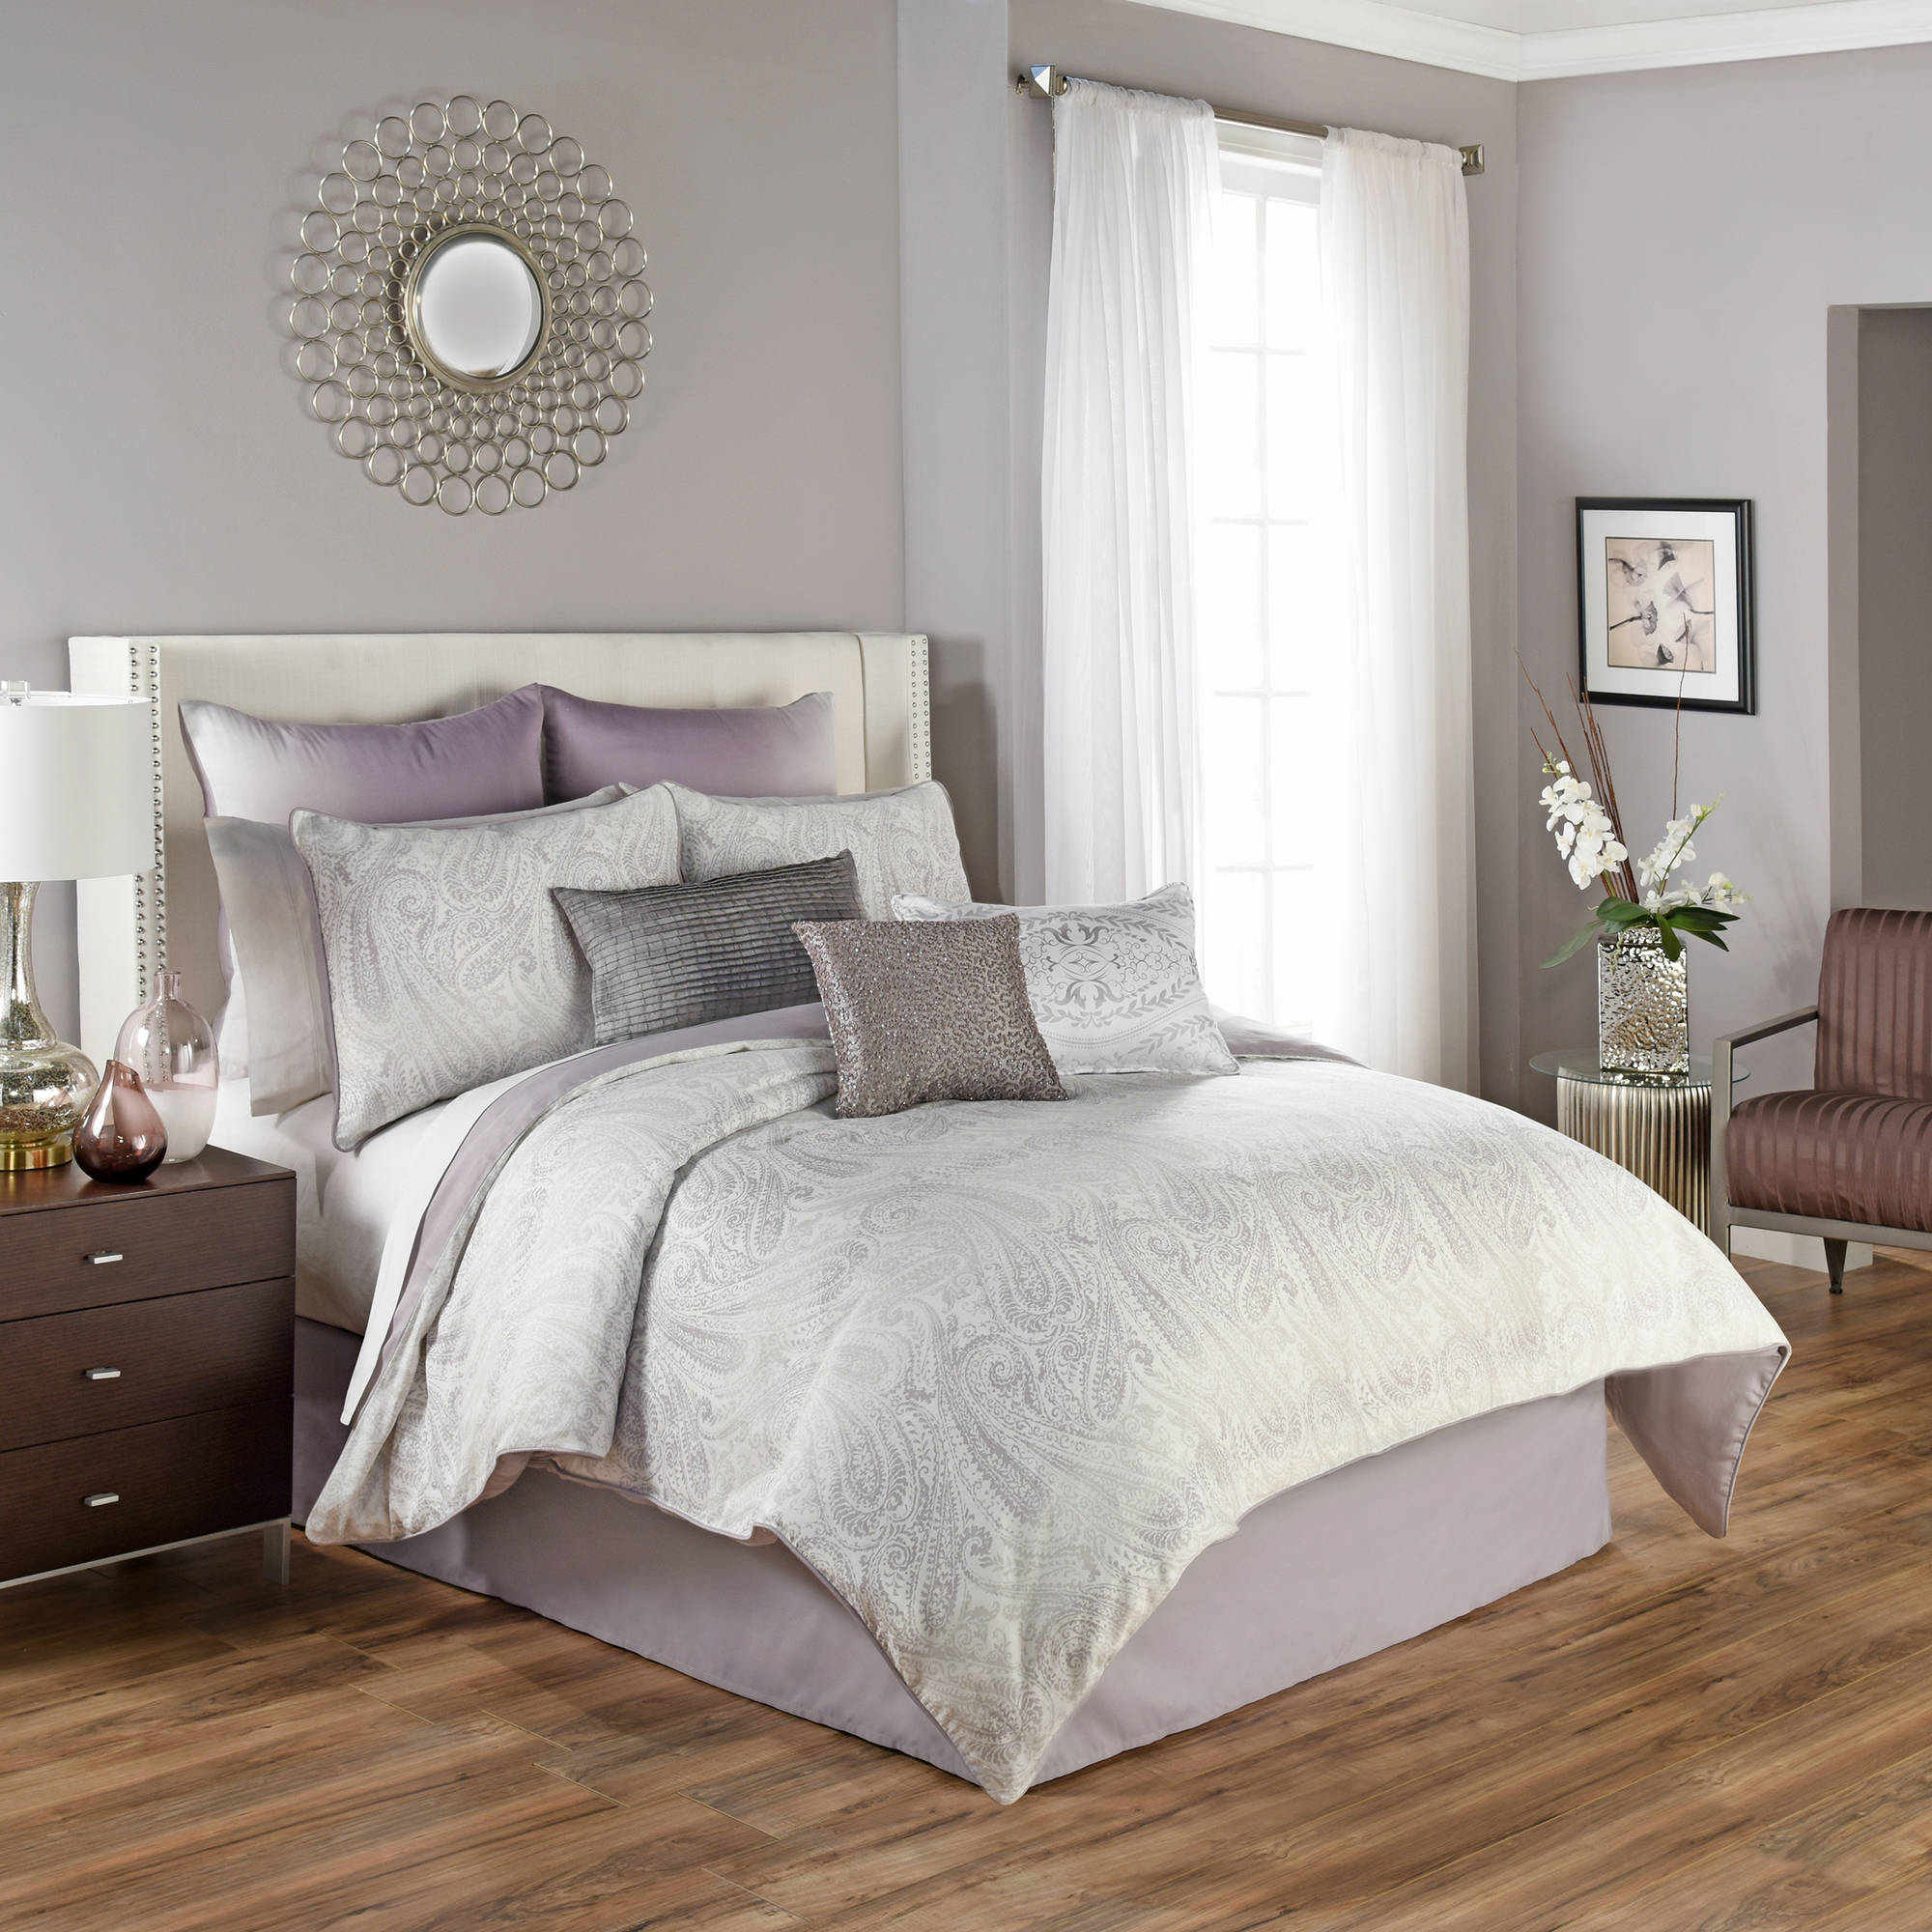 Beautyrest Henriette 4 Piece Comforter Set